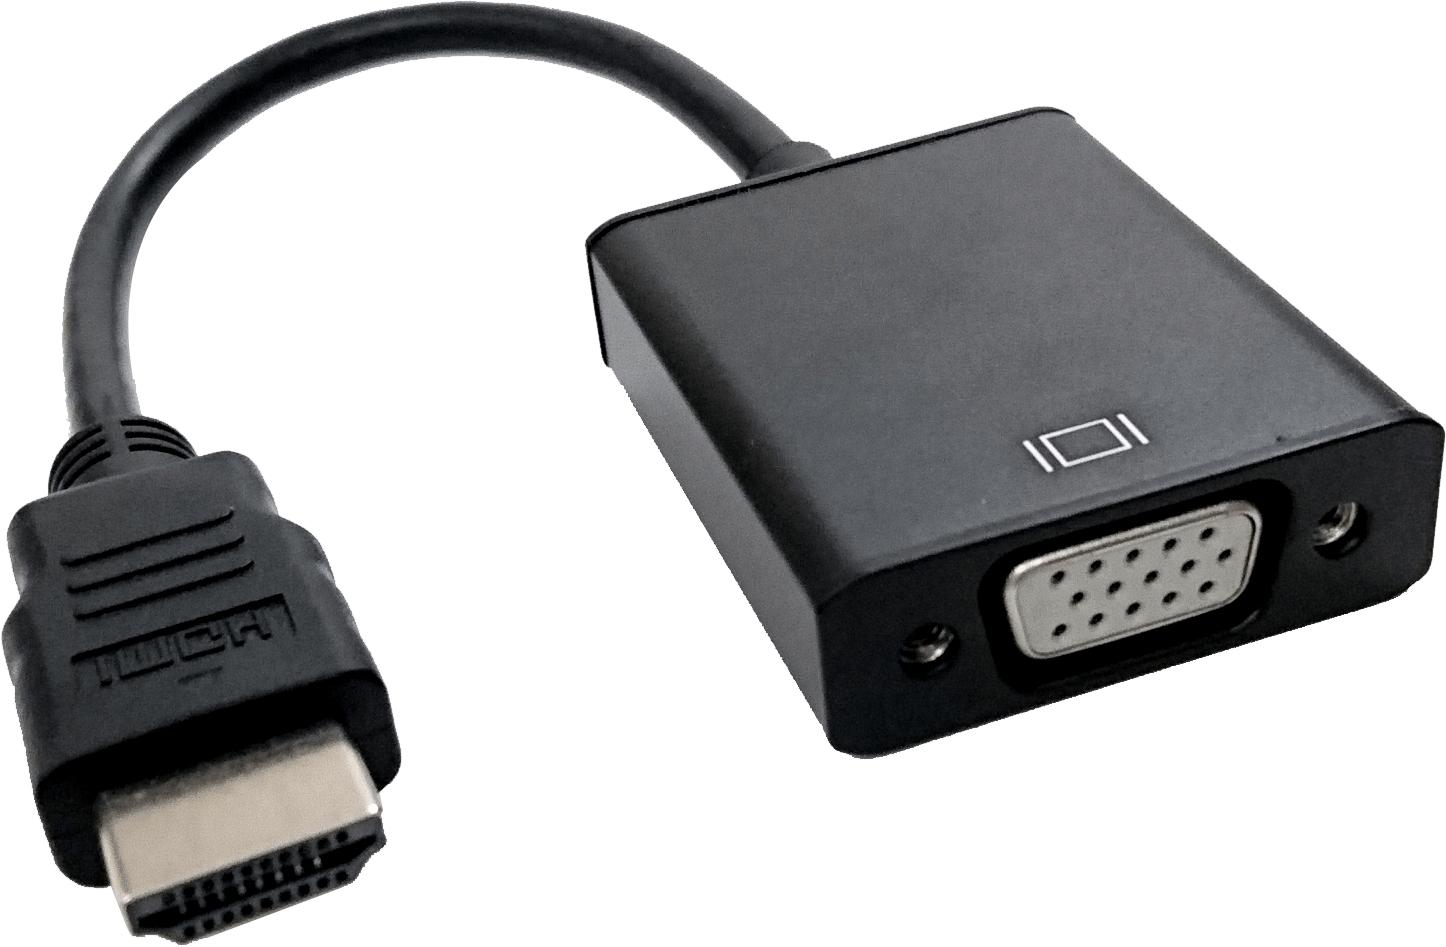 HDMI 轉 VGA與Audio 訊號轉換器 含3.5mm音源與Micro USB電源輸入 | 銘鵬科技股份有限公司